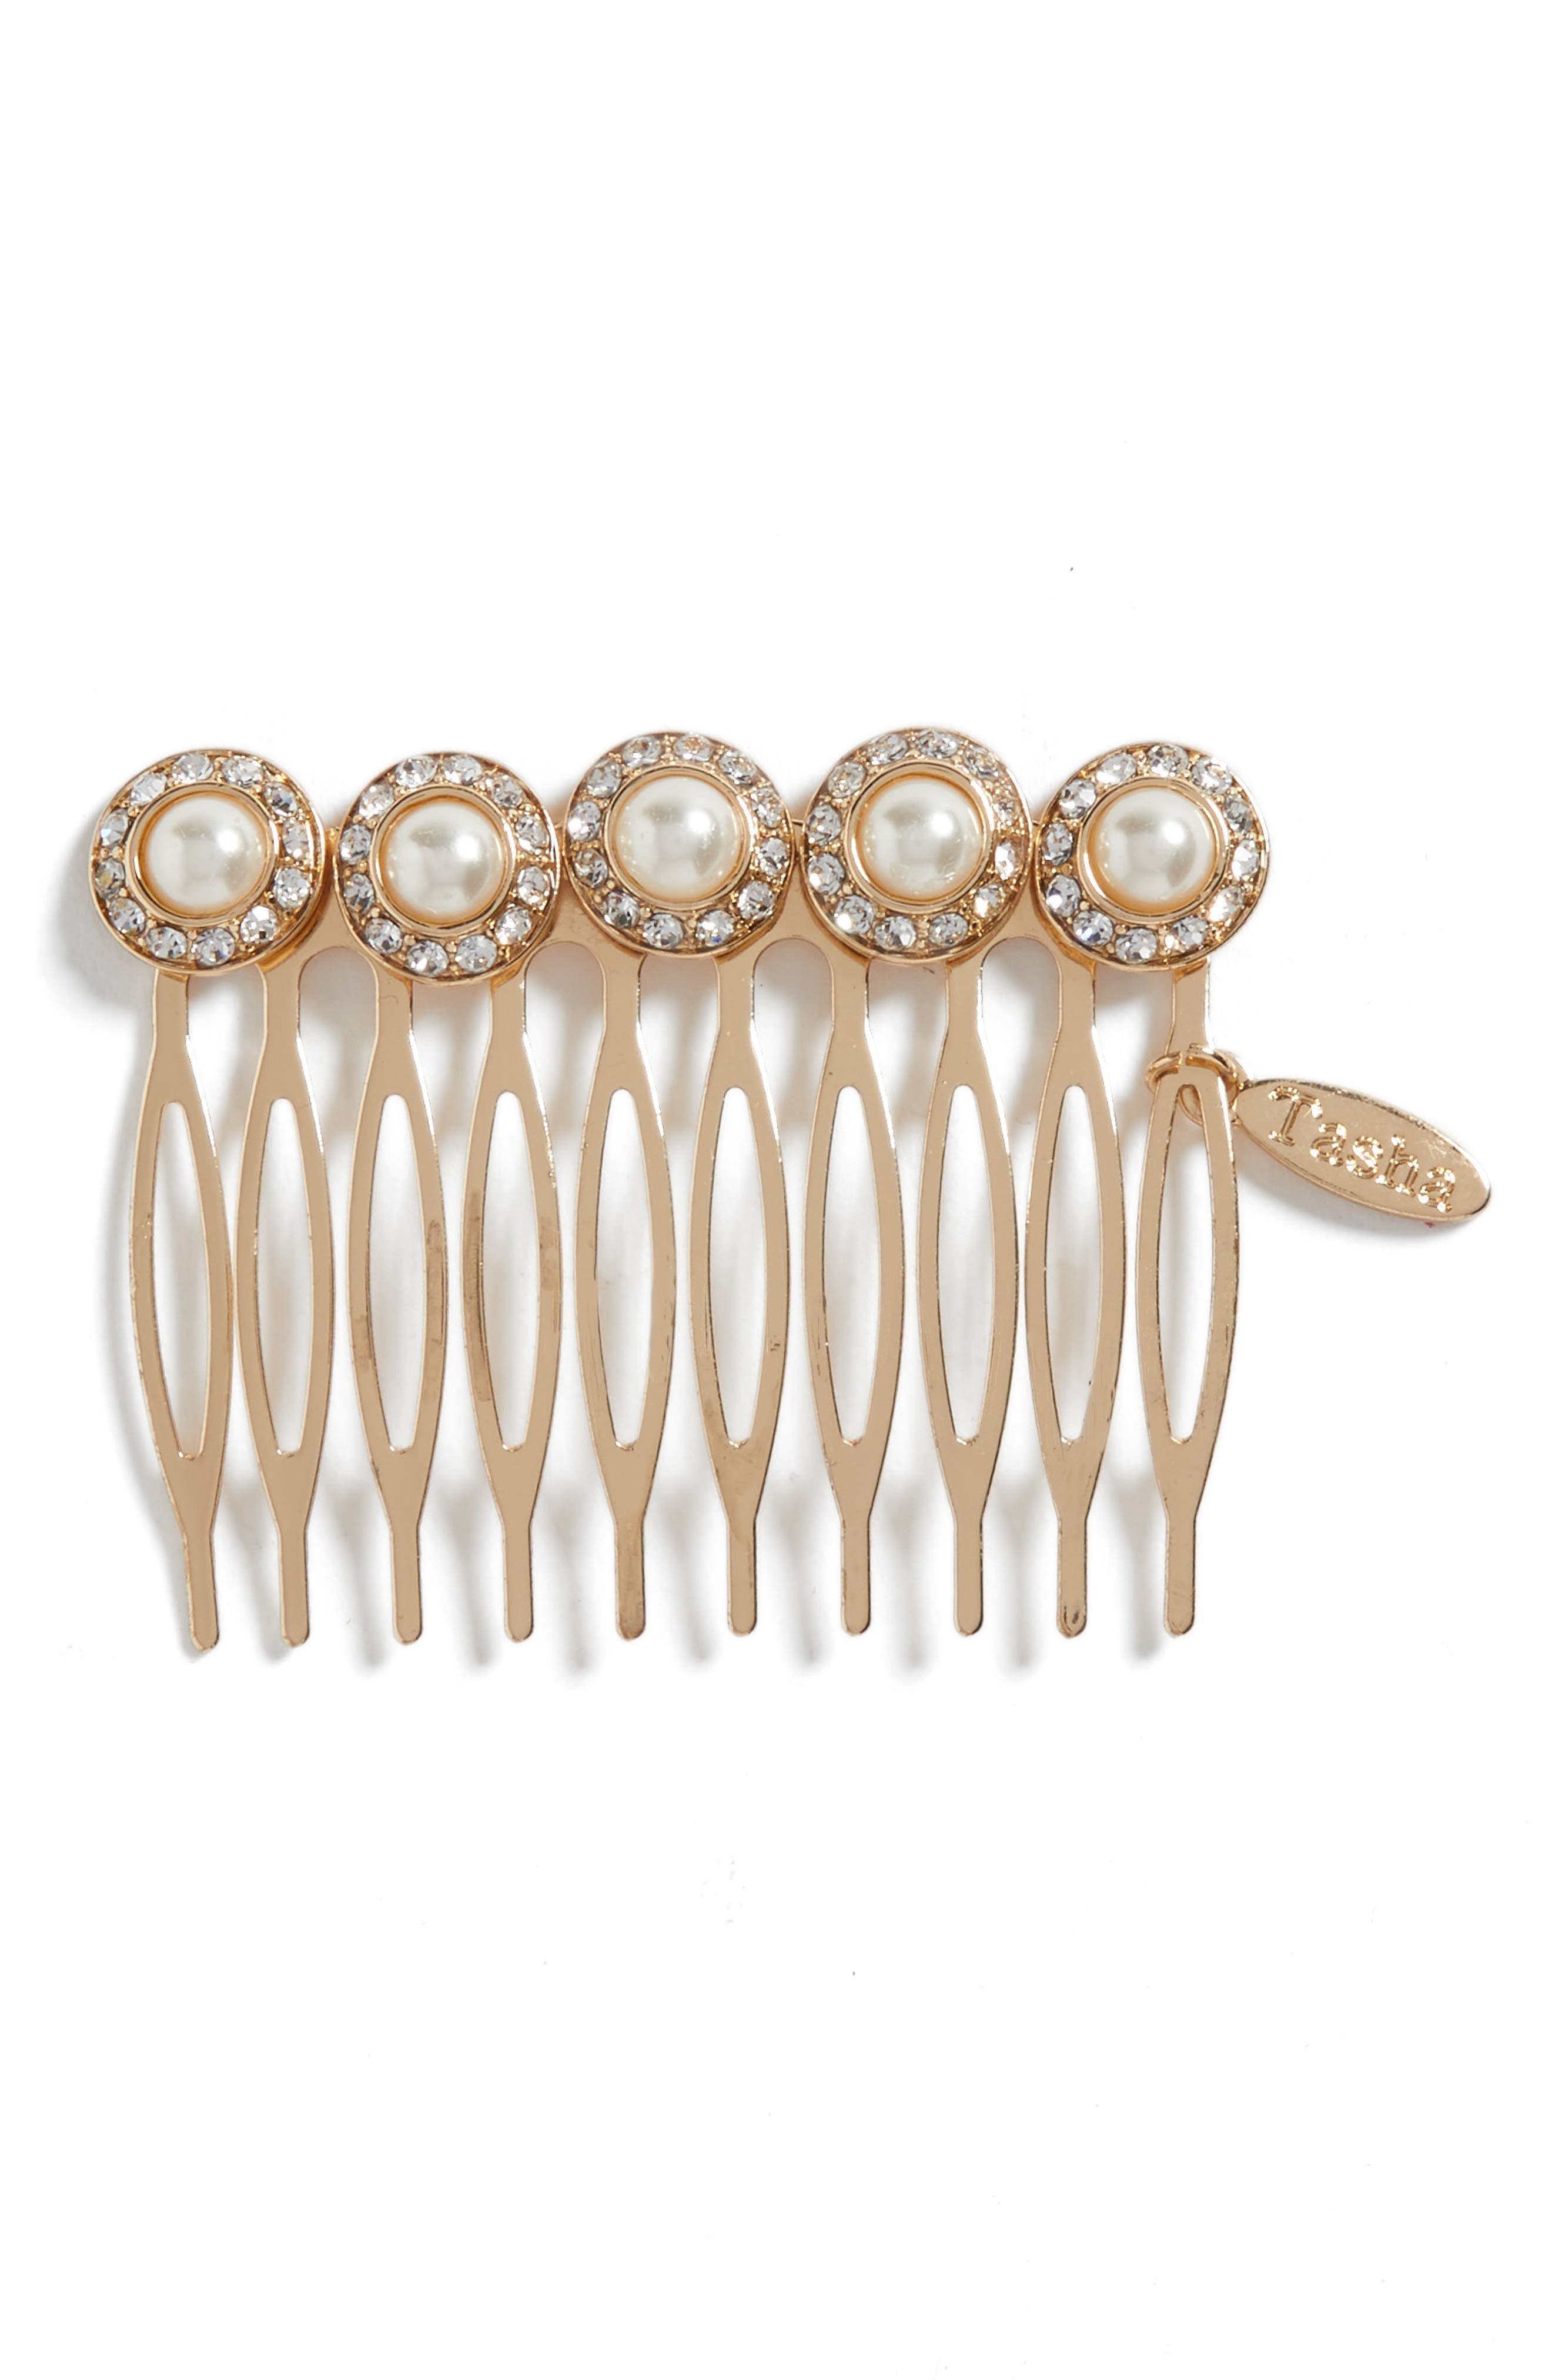 Main Image - Tasha Imitation Pearl Embellished Hair Comb